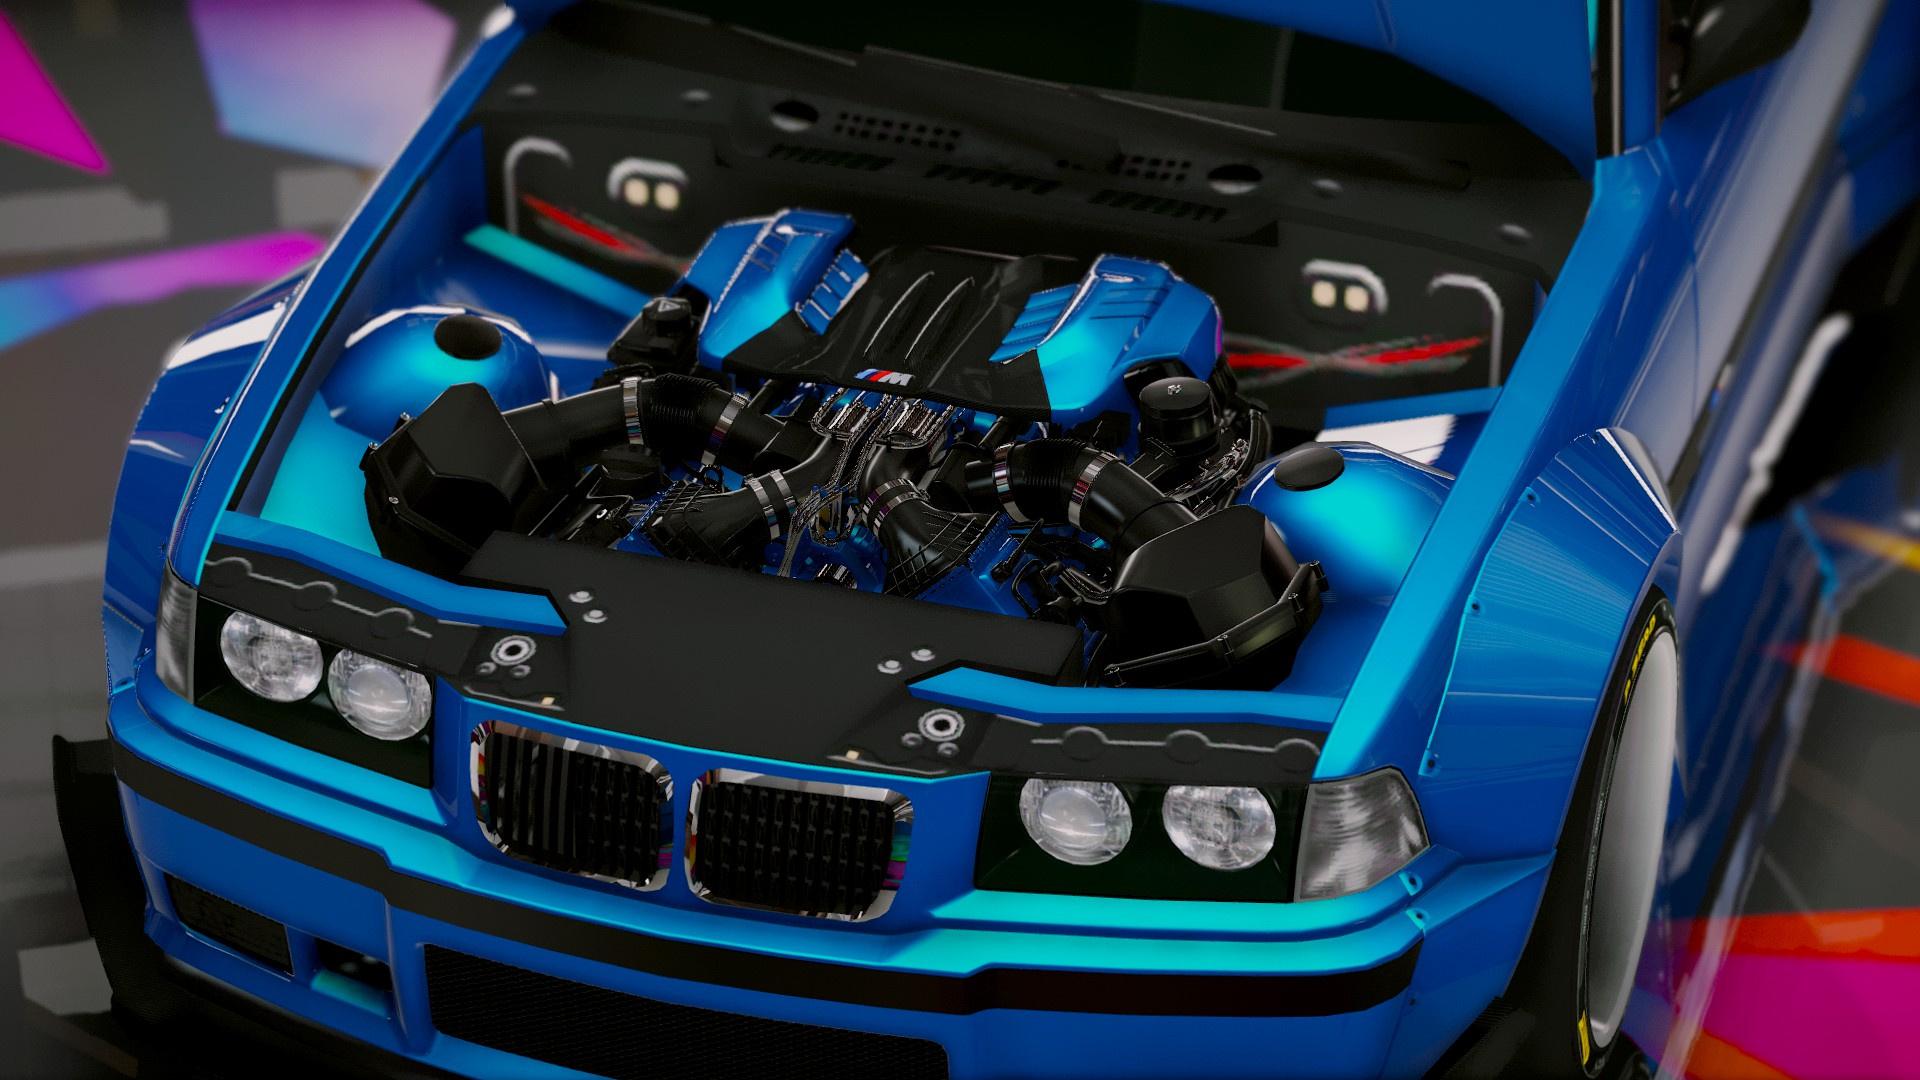 Tuner Car Wallpaper Hd Bmw M3 E36 Rocket Bunny Add On Tuning Gta5 Mods Com